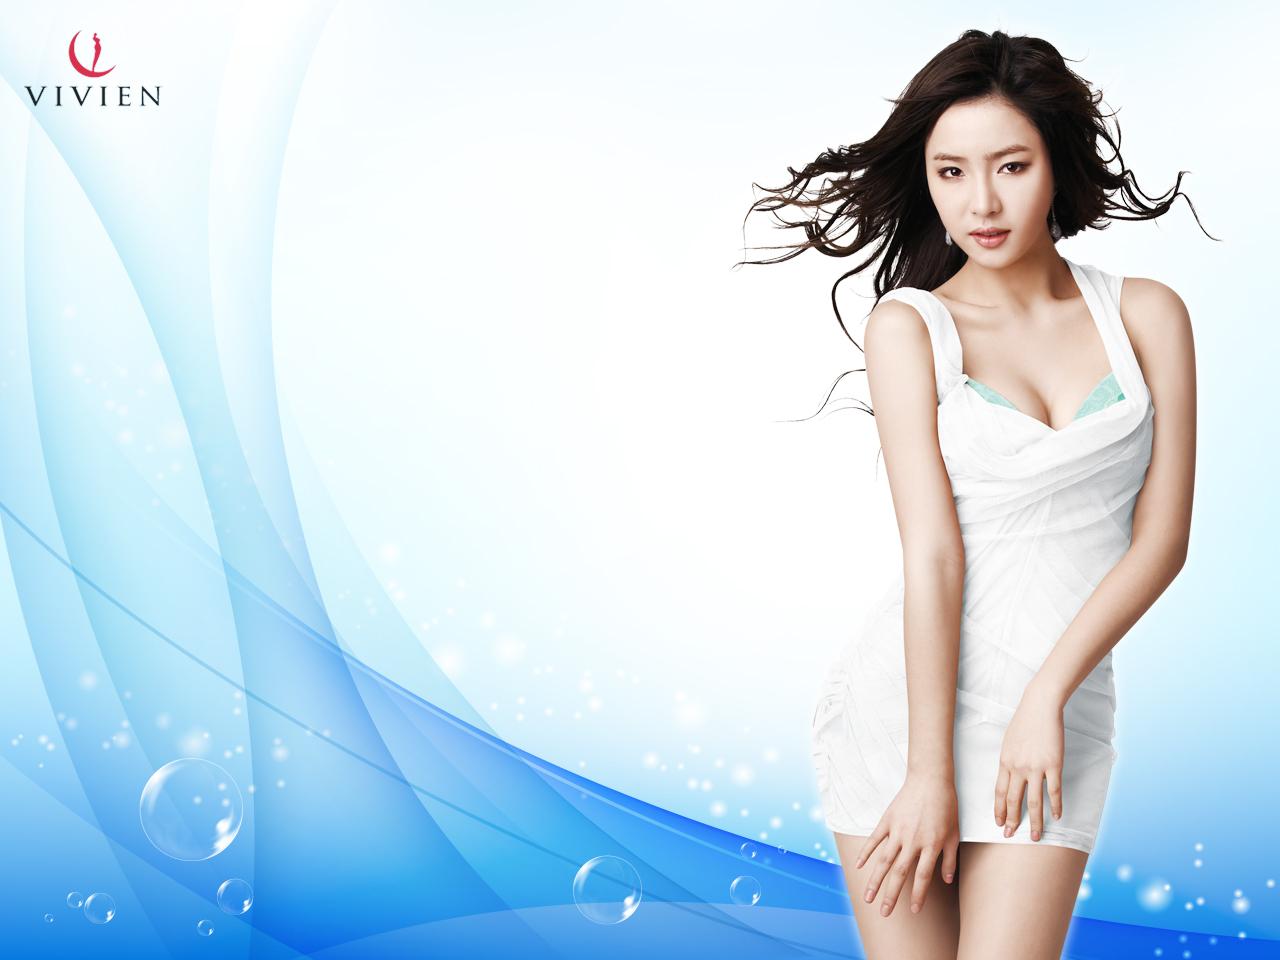 Vivien - Shin Se Kyung Wallpaper (32967459) - Fanpop fanclubs